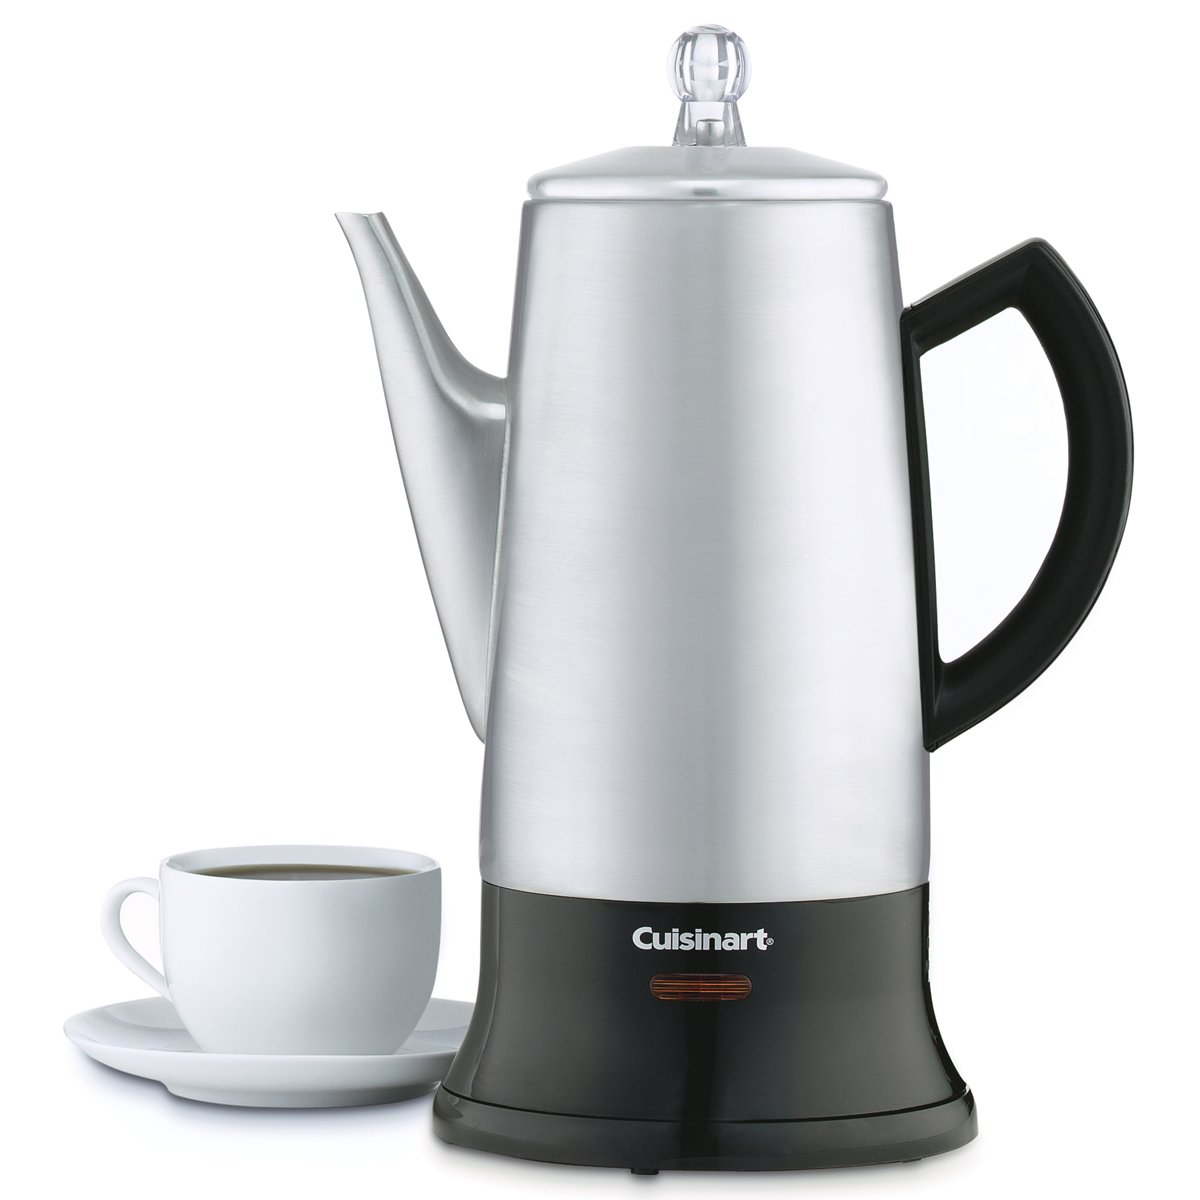 12 Cup Cordless Perculator Coffee Maker Cuisinart PER-12BCC